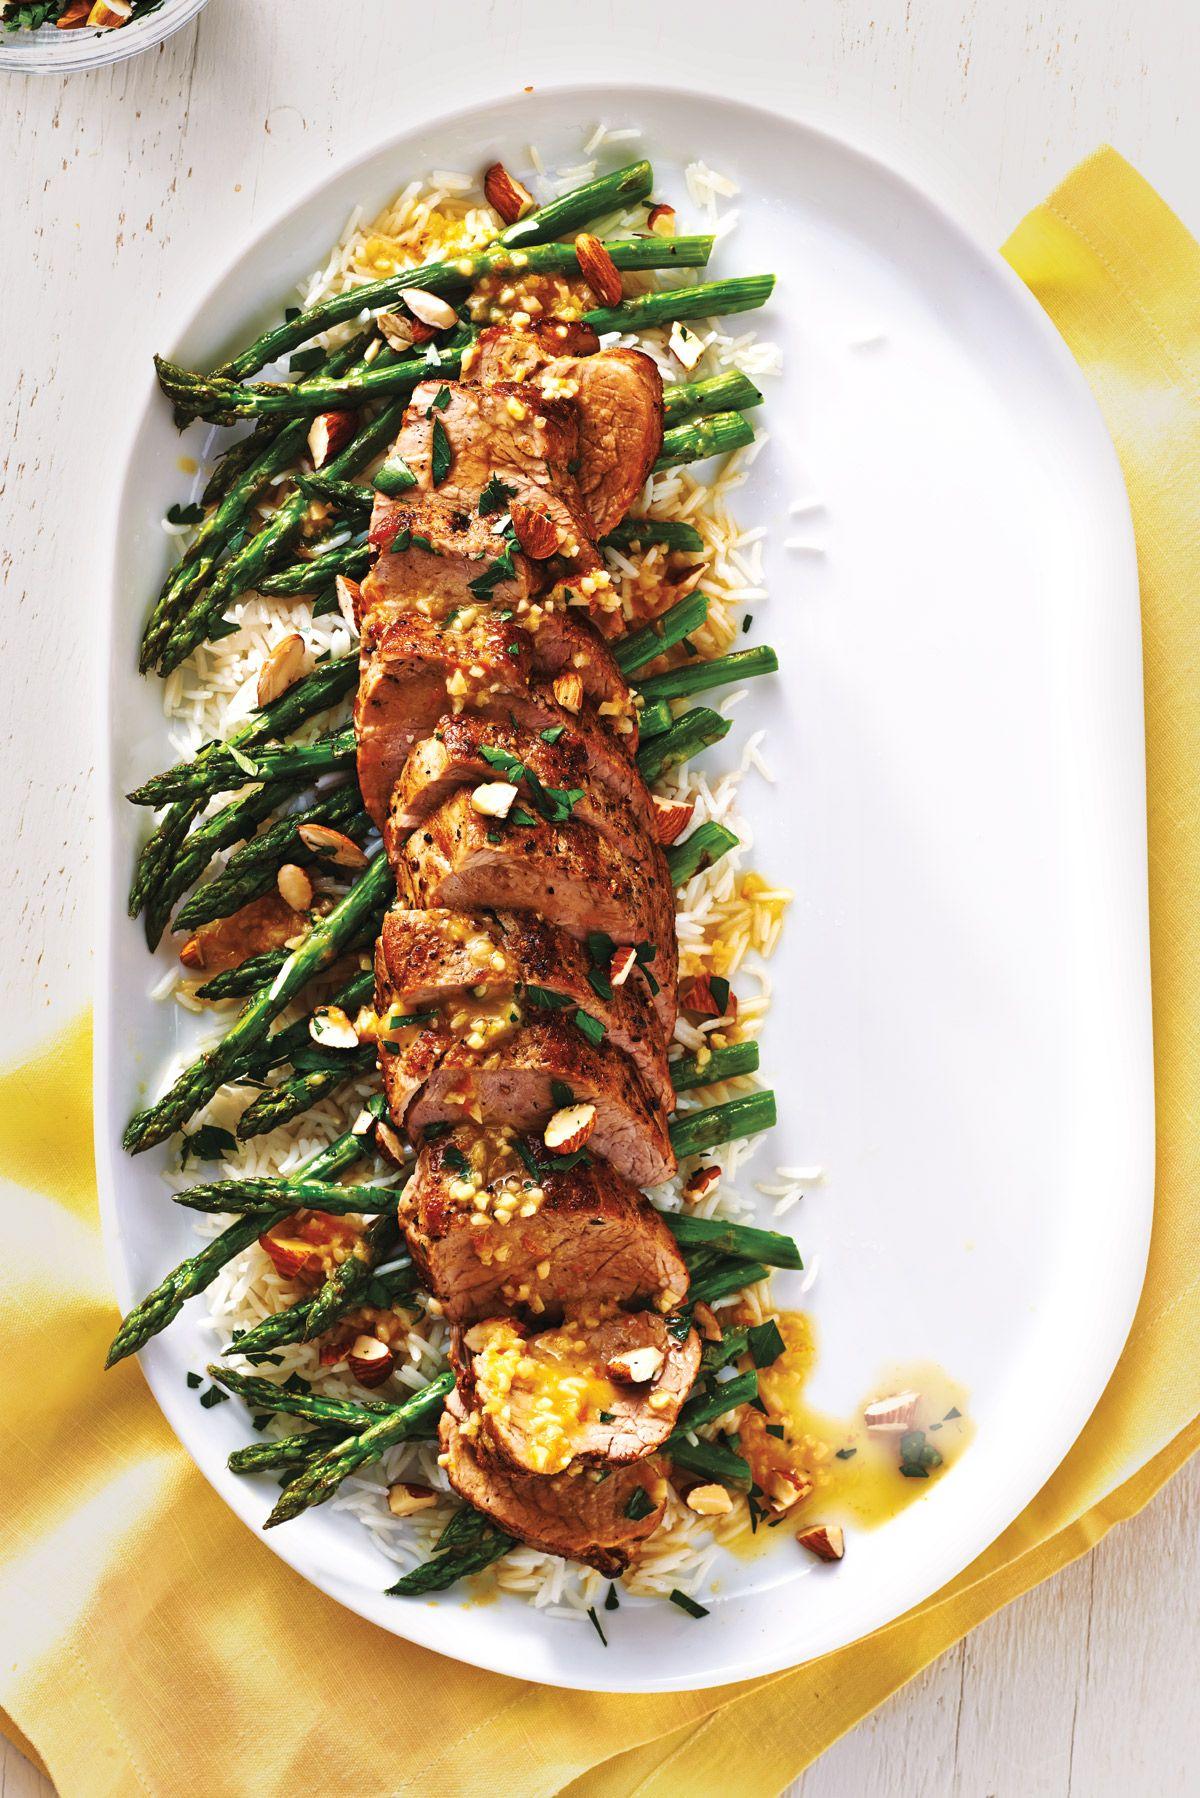 Pork Tenderloin With Roasted Asparagus and Warm Citrus Sauce | Canadian Living